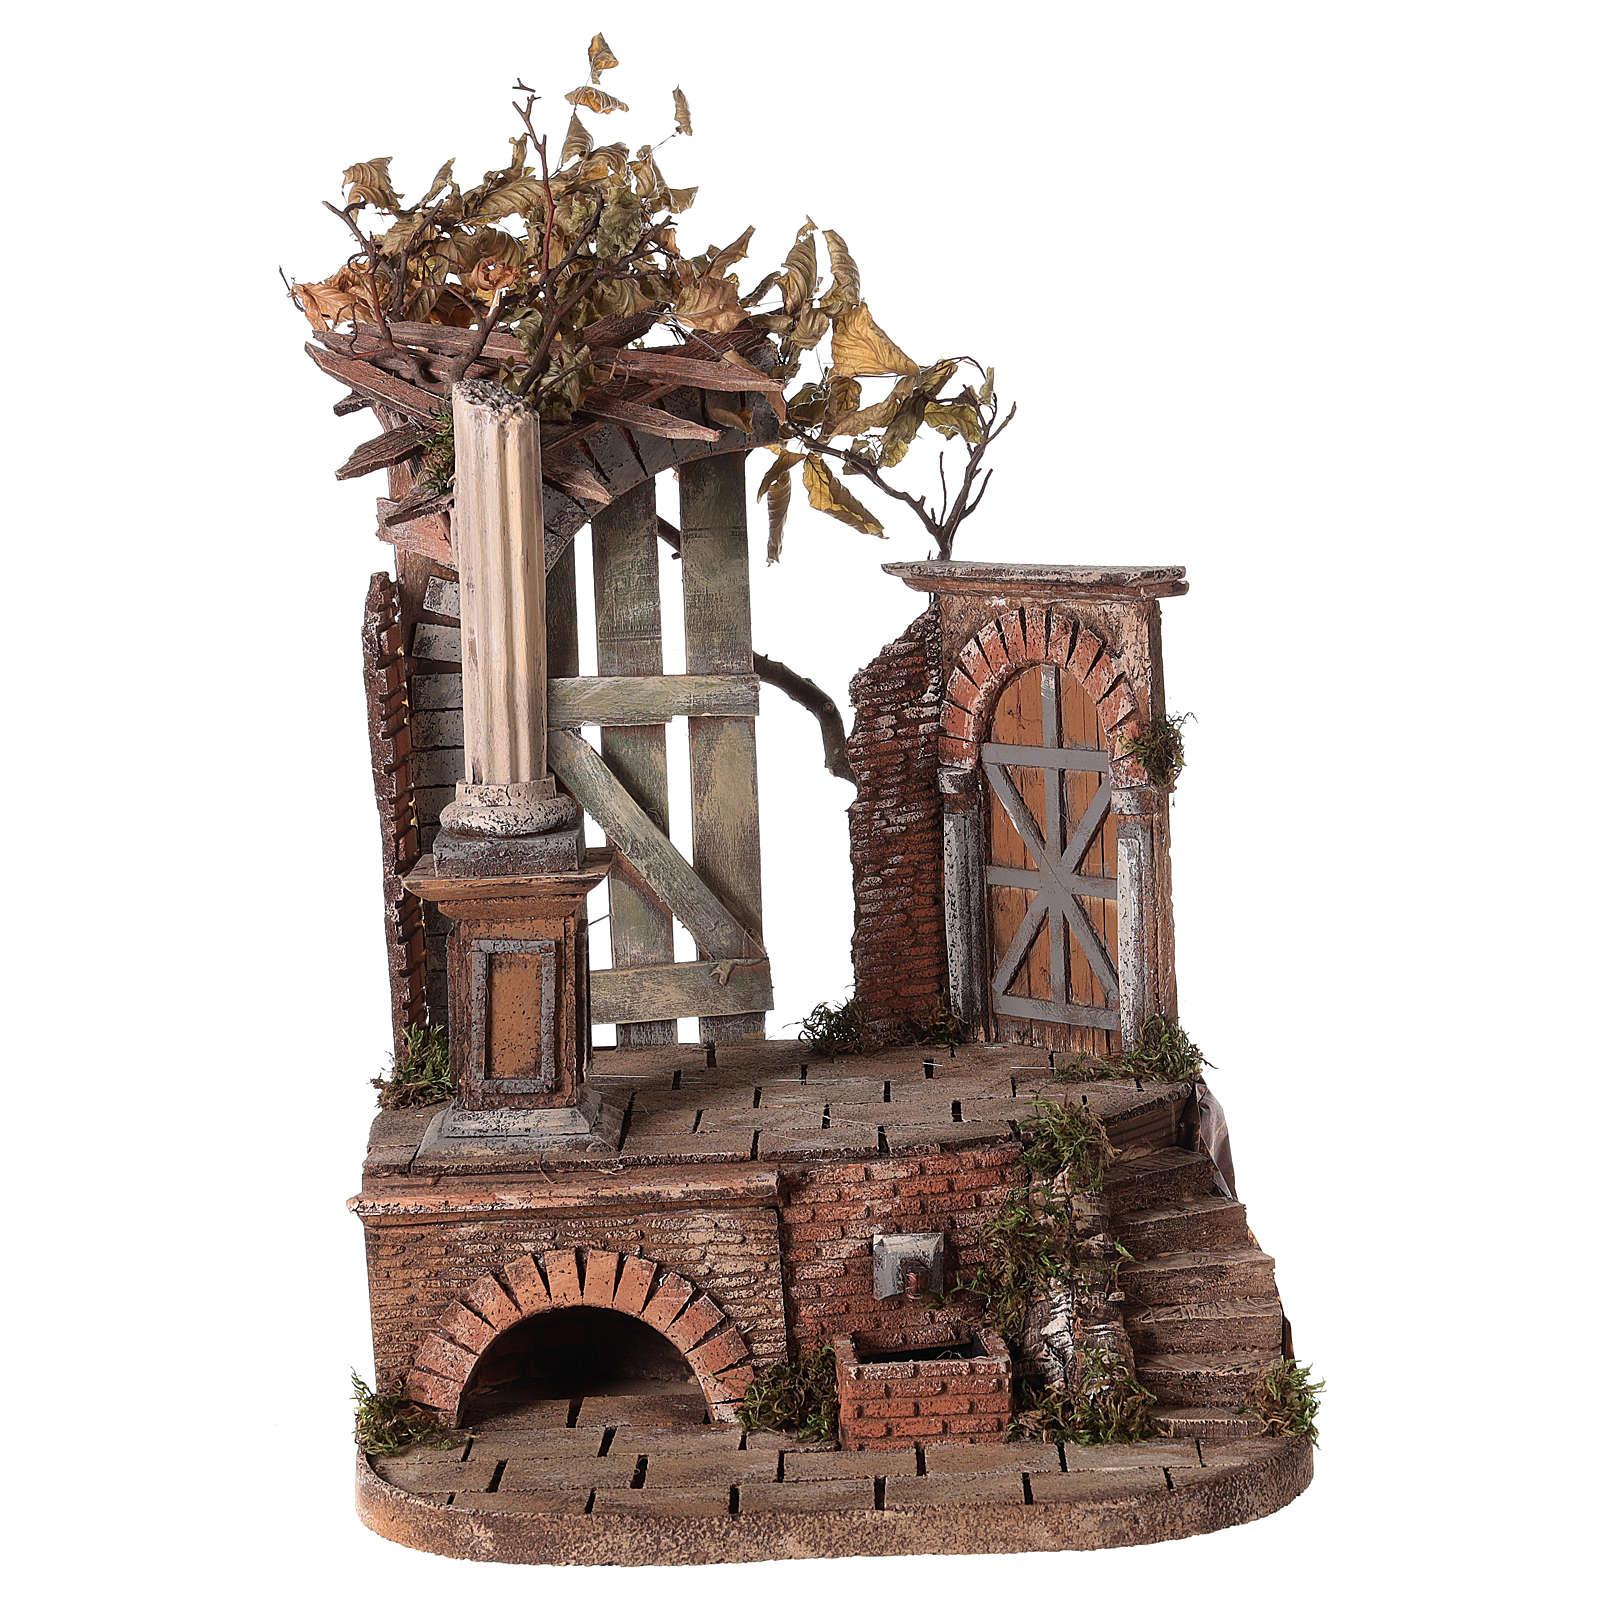 Tempio romano con fontana 55x35x40 presepe napoletano 12-14-16 cm 4